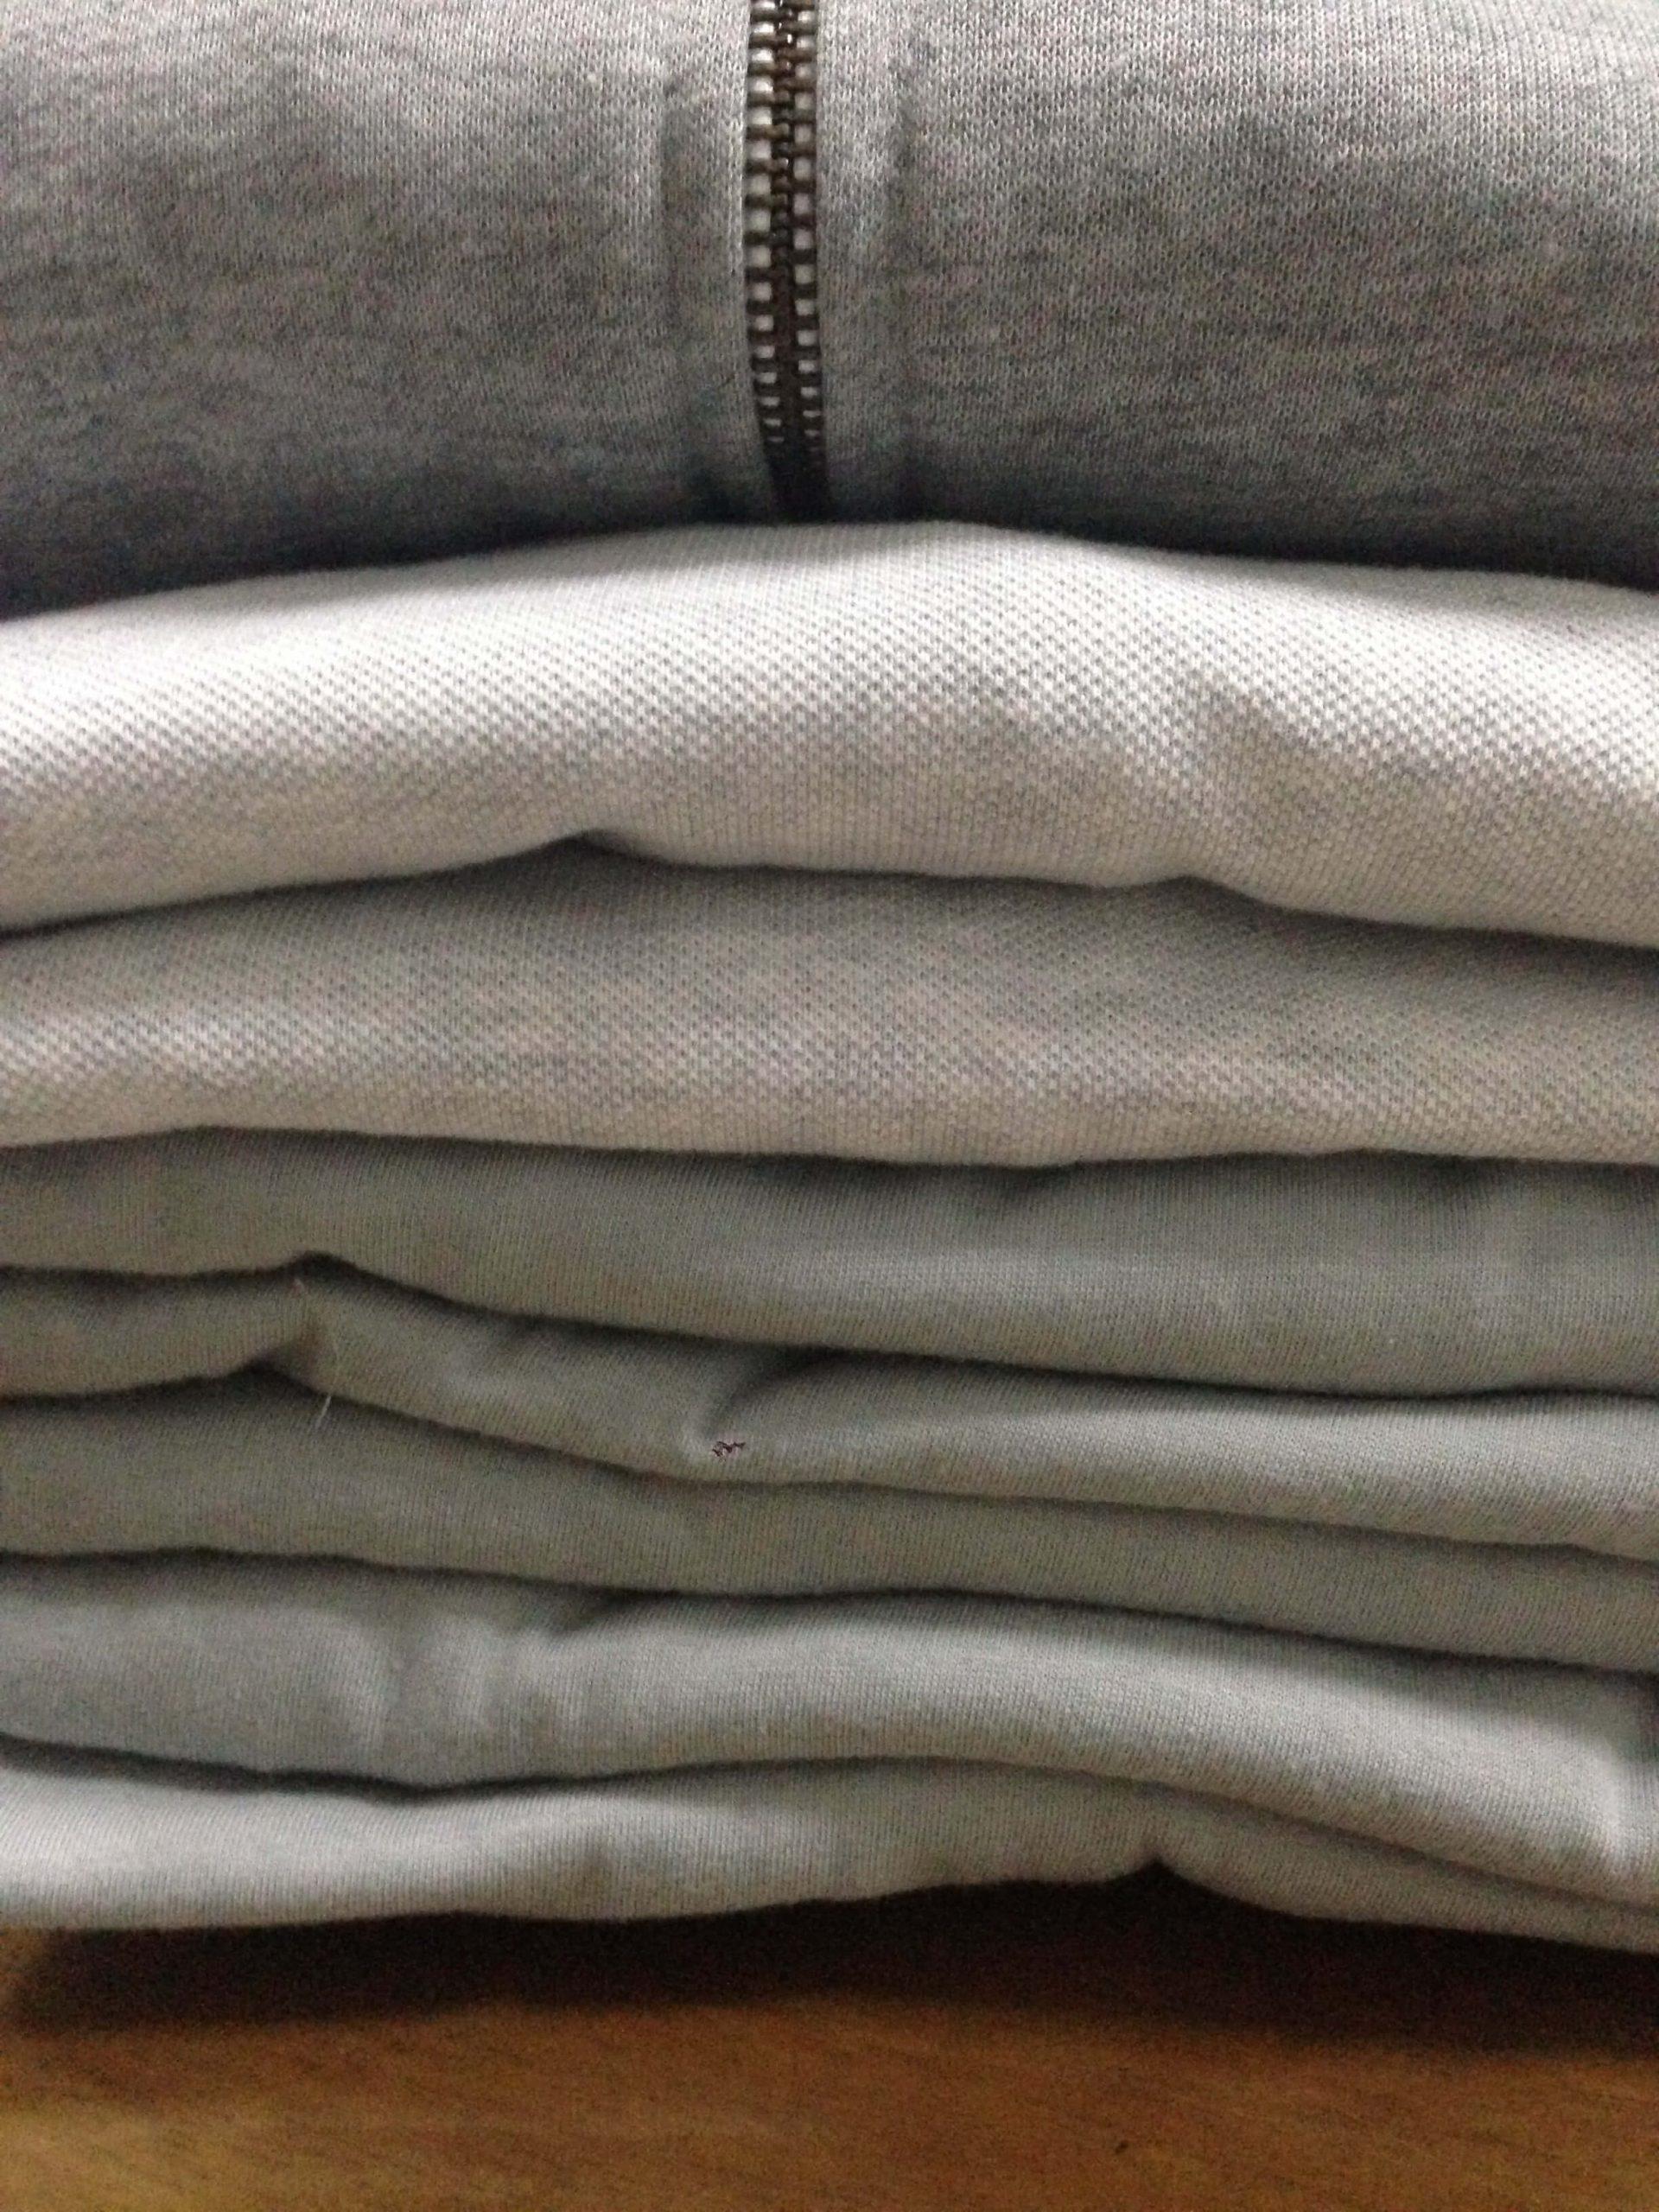 ClothingManufacturingAgentBali-determining-your-clothing-Order-quantity2